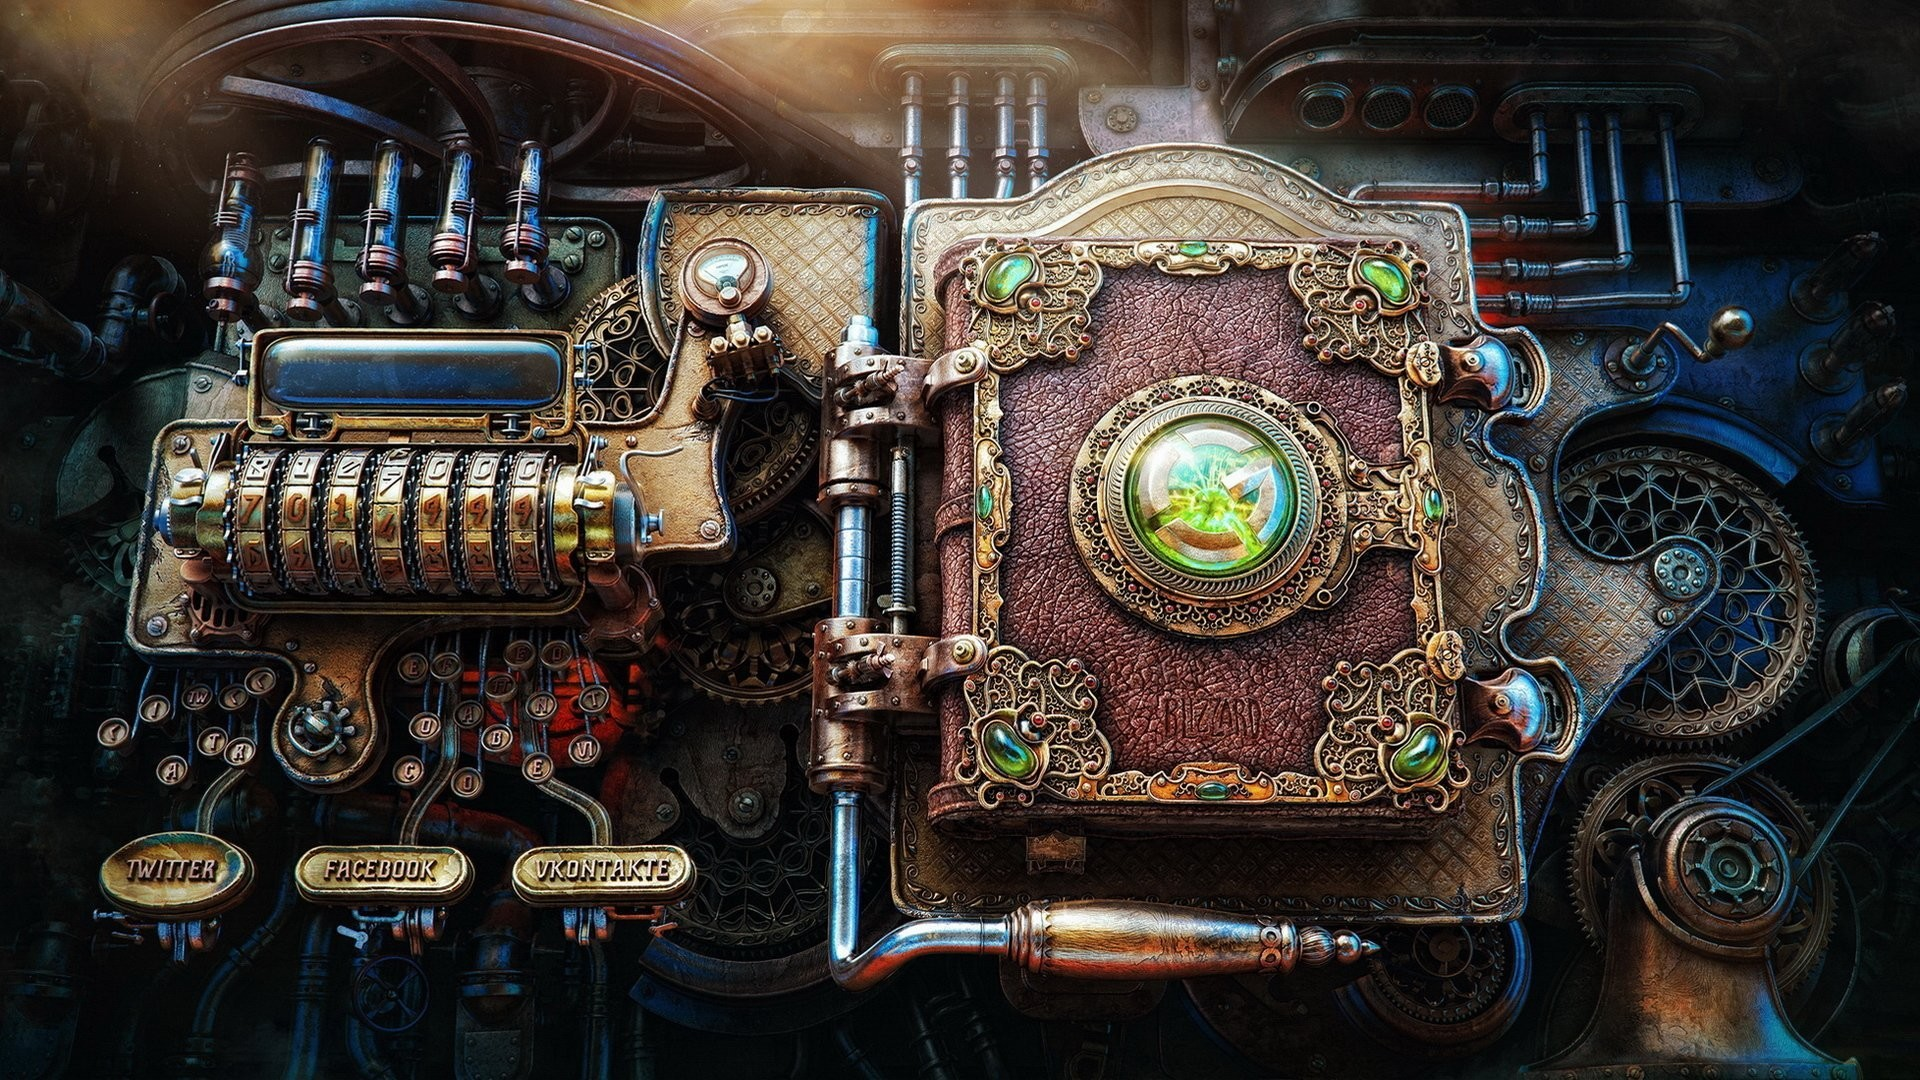 render steampunk fiction book the mechanism steampunk .